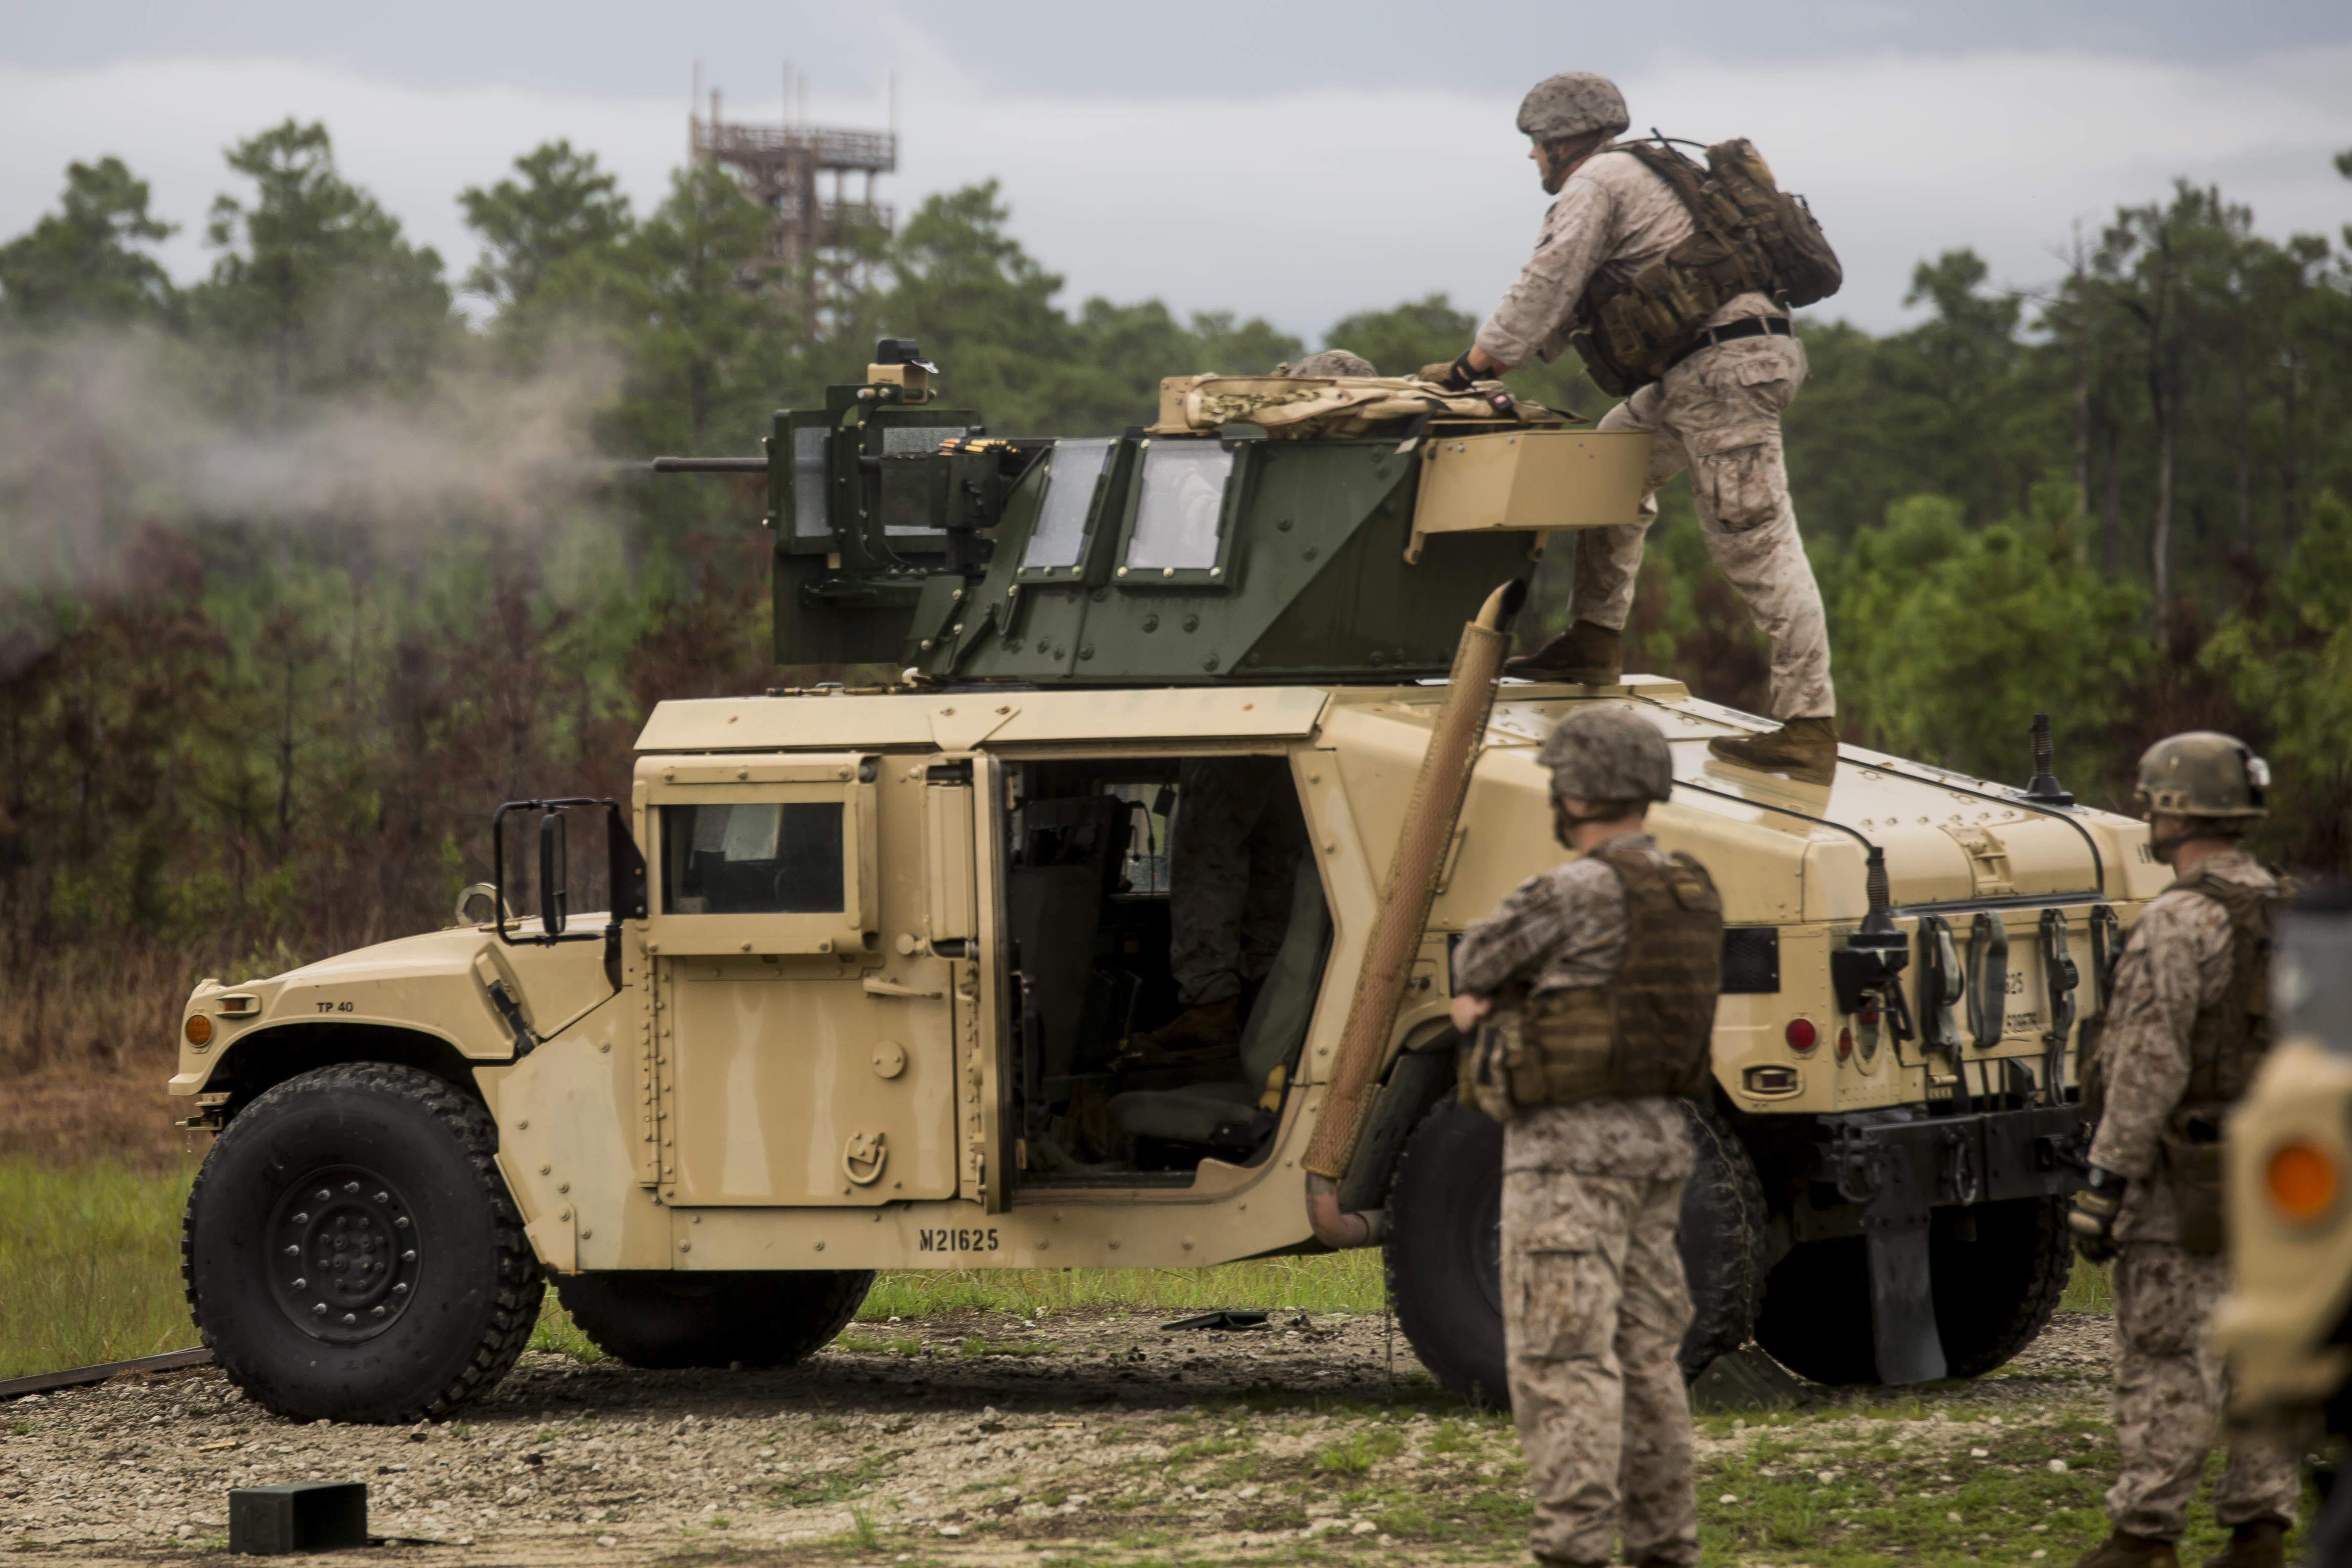 A Marine with 2nd Air Naval Gunfire Liaison Company, II Marine Expeditionary Force shoots an